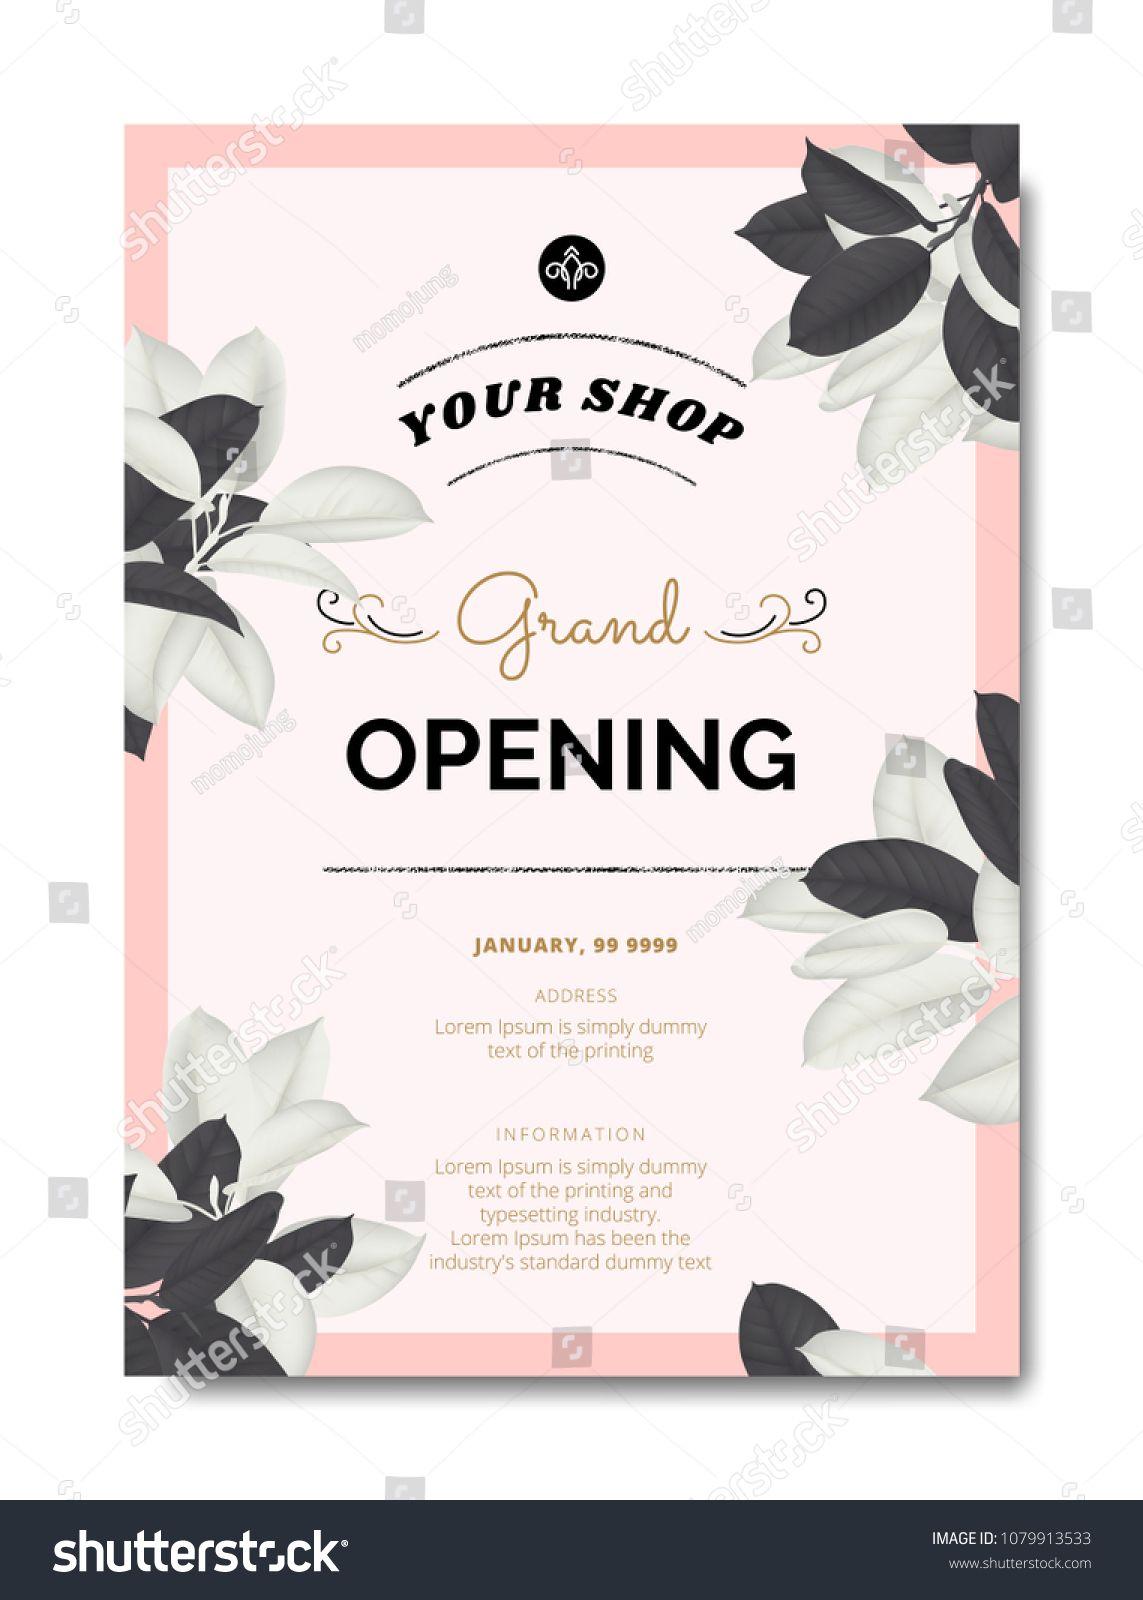 Https Www Shutterstock Com De Image Vector Botanical Grand Opening Invitation C Shop Opening Invitation Card Grand Opening Invitations Invitation Card Sample